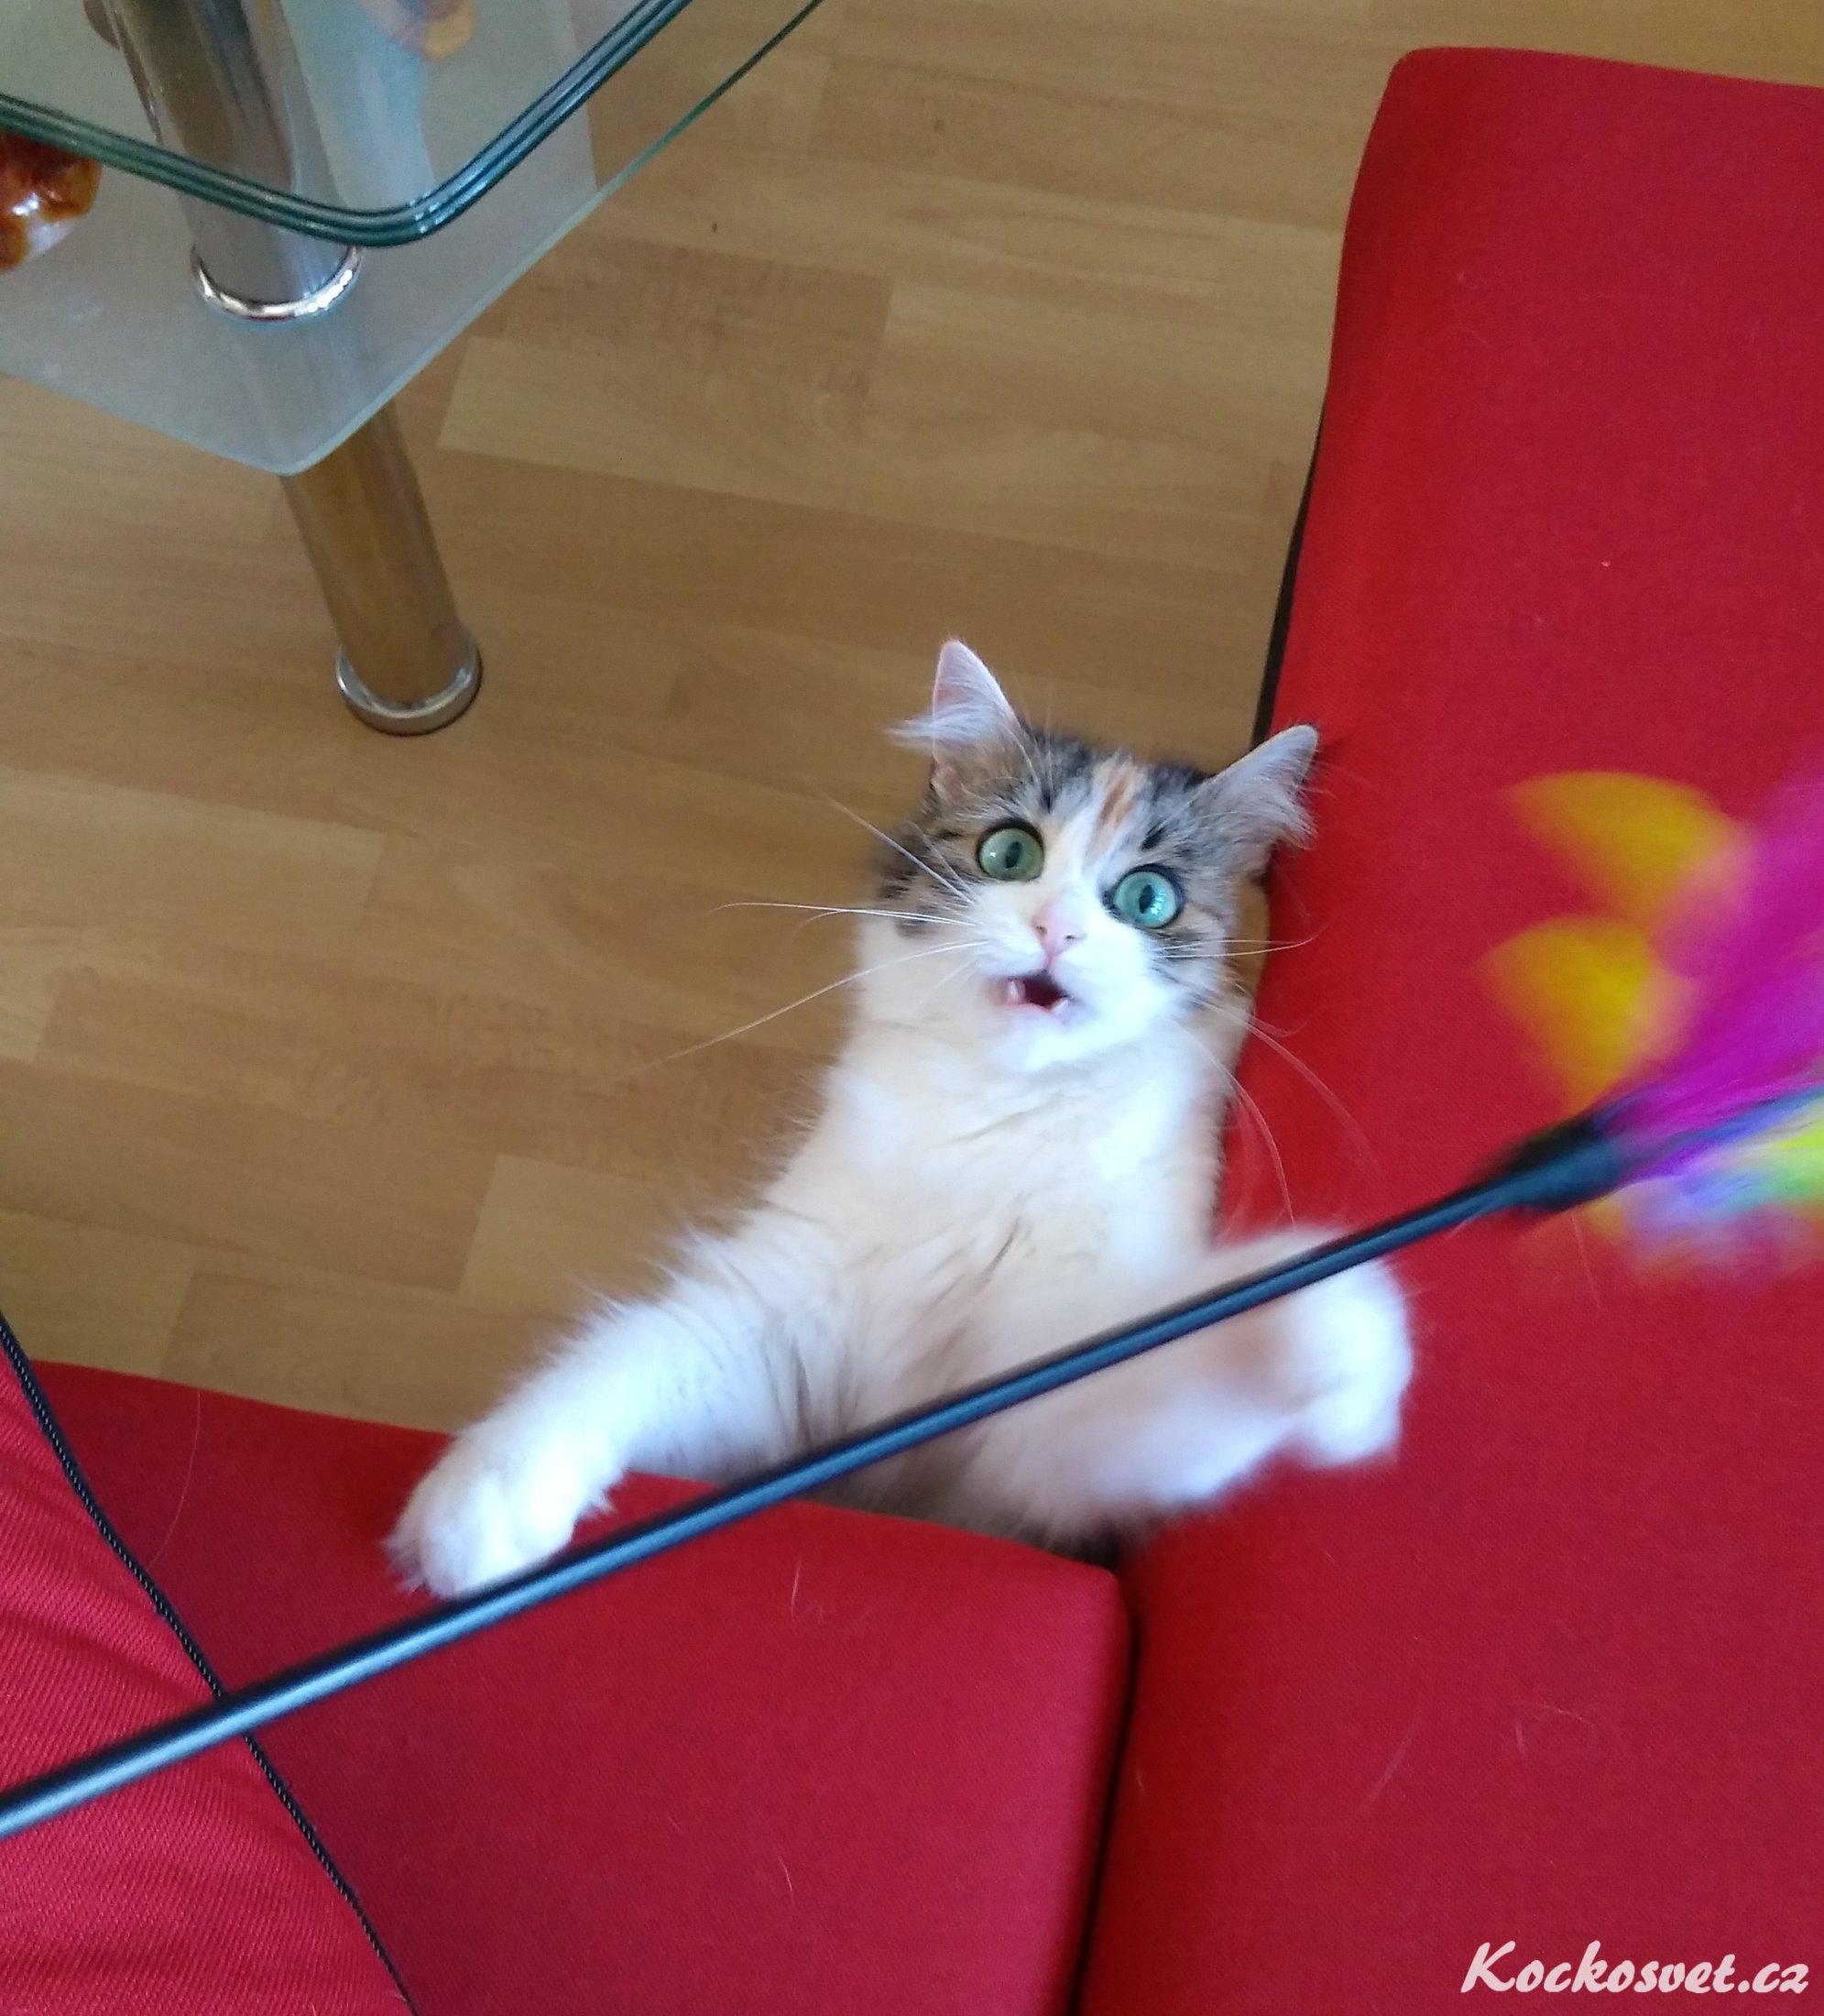 Velká kočička pic galerie